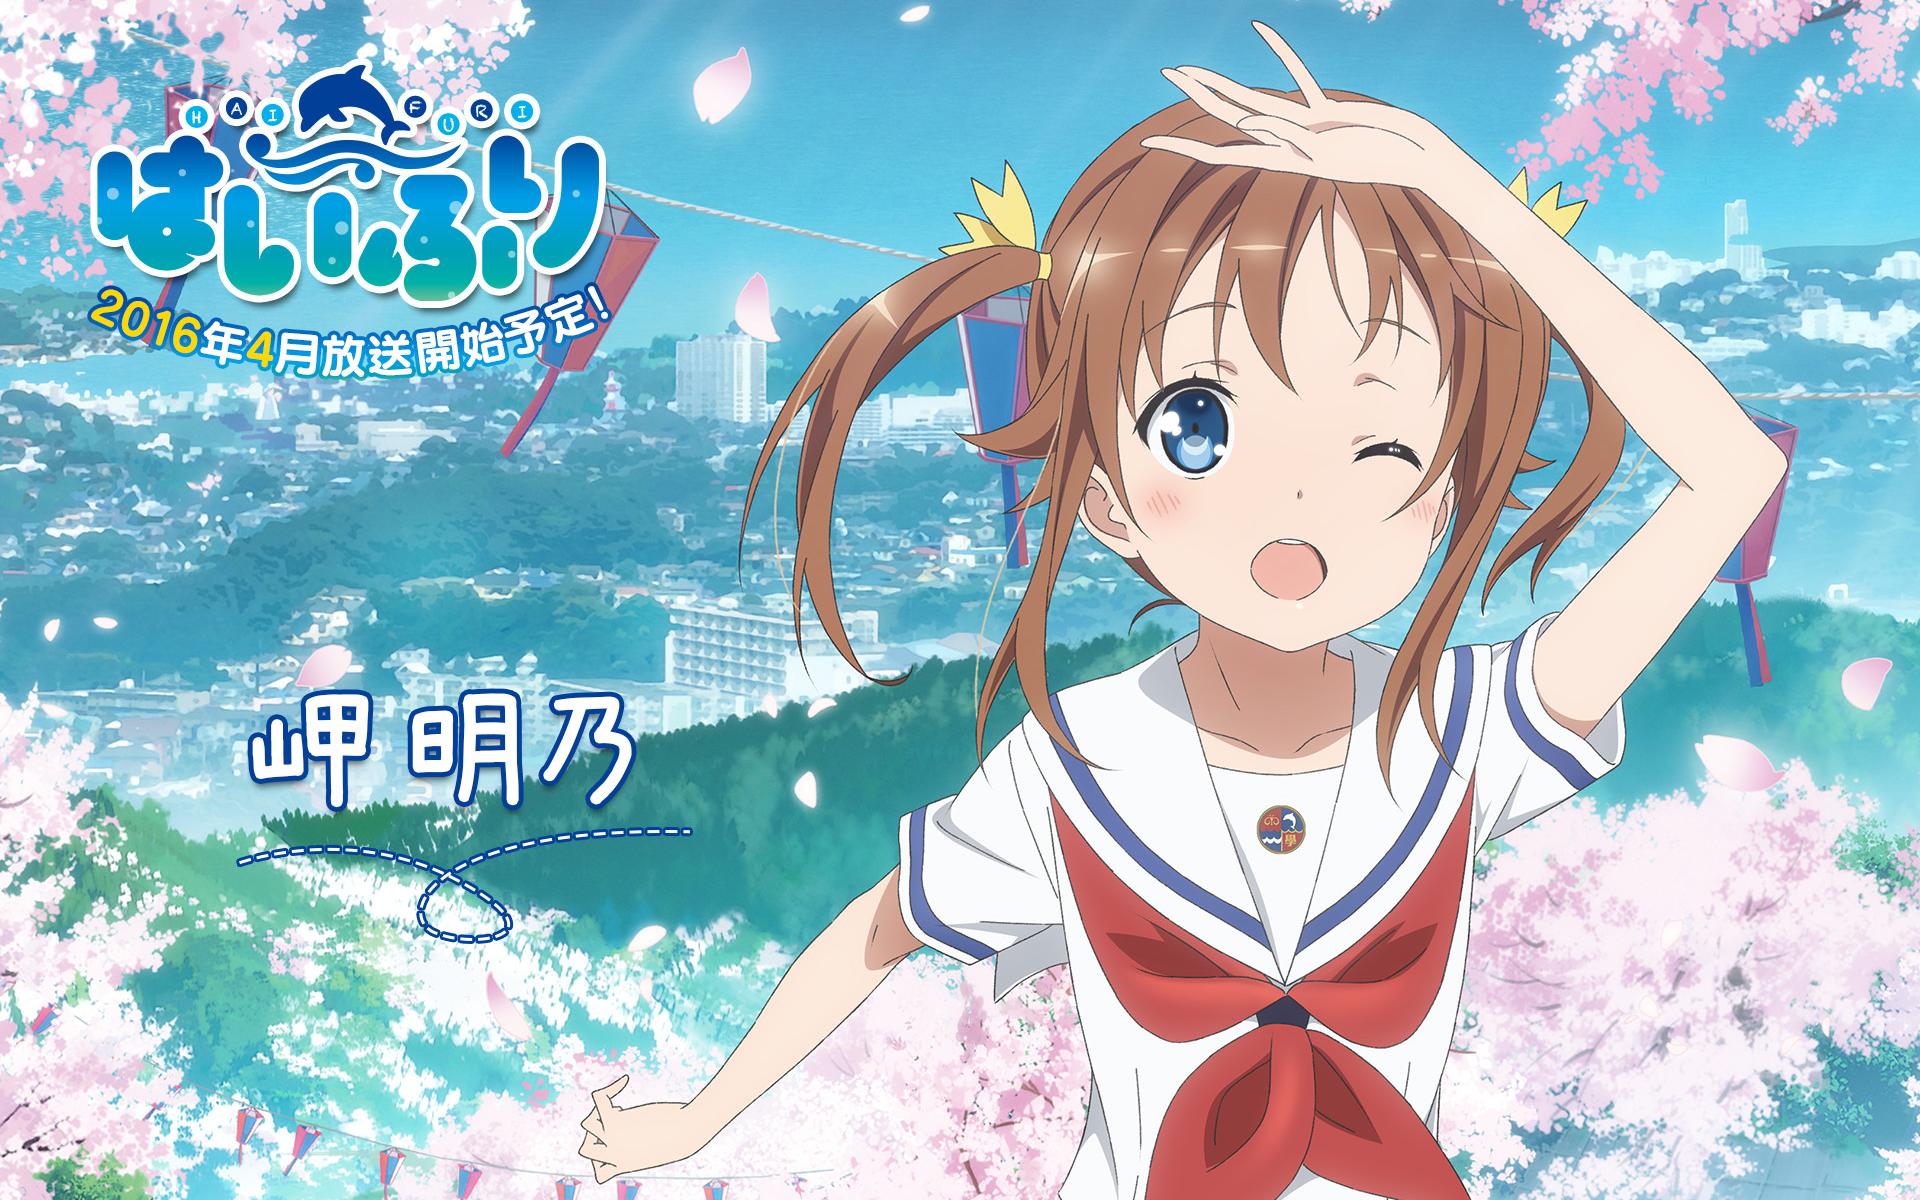 Anime High School Fleet Akeno Misaki Haifuri Wallpaper